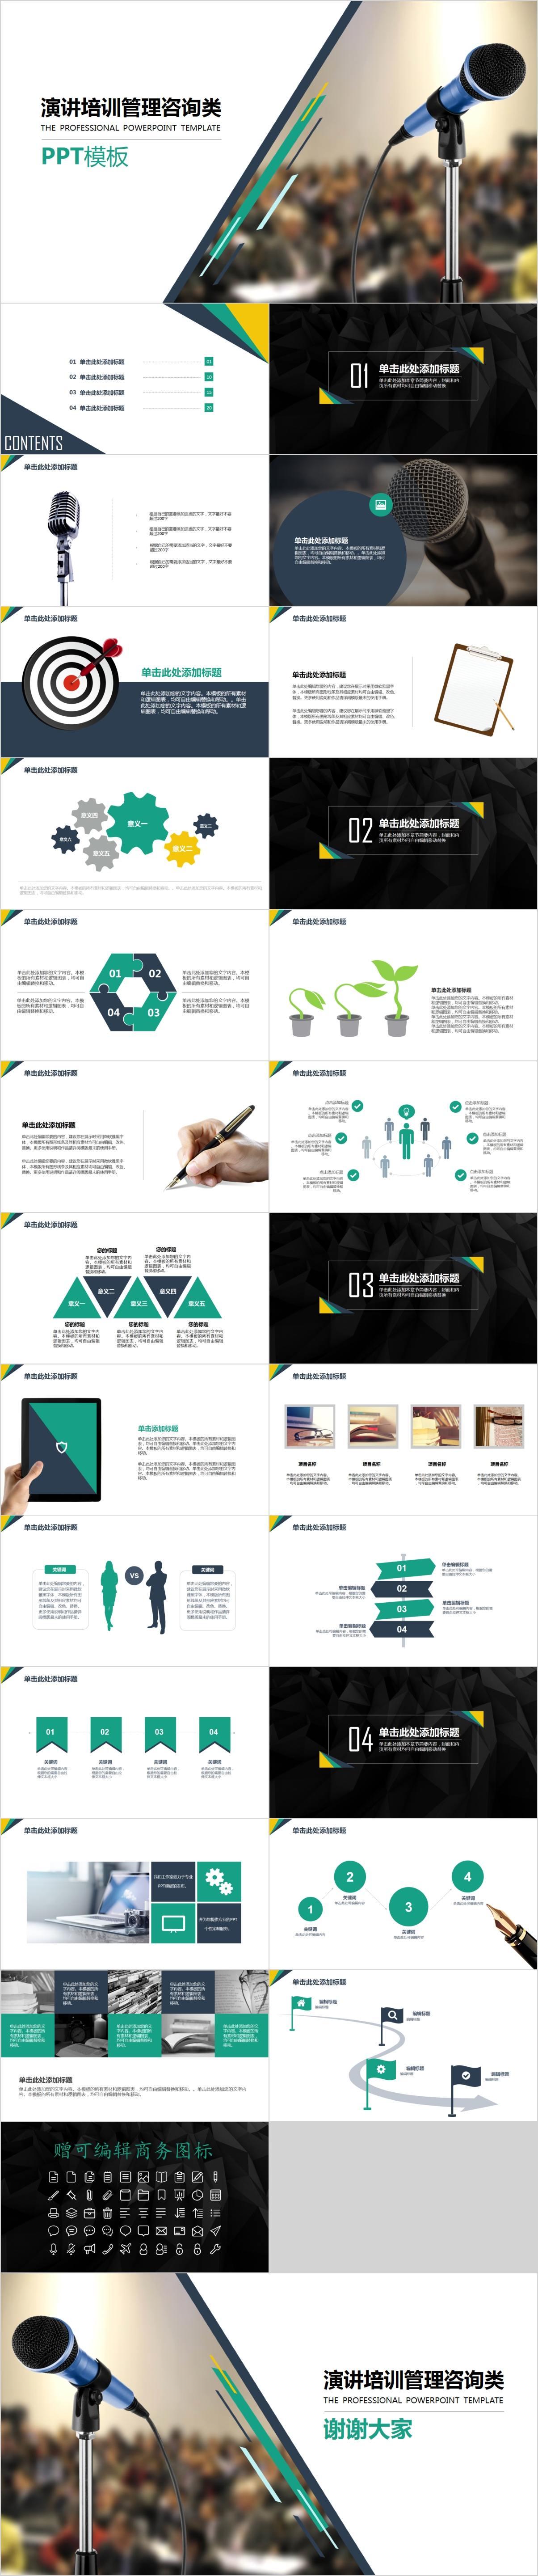 YY0023 商务公开演讲培训咨询PPT模板